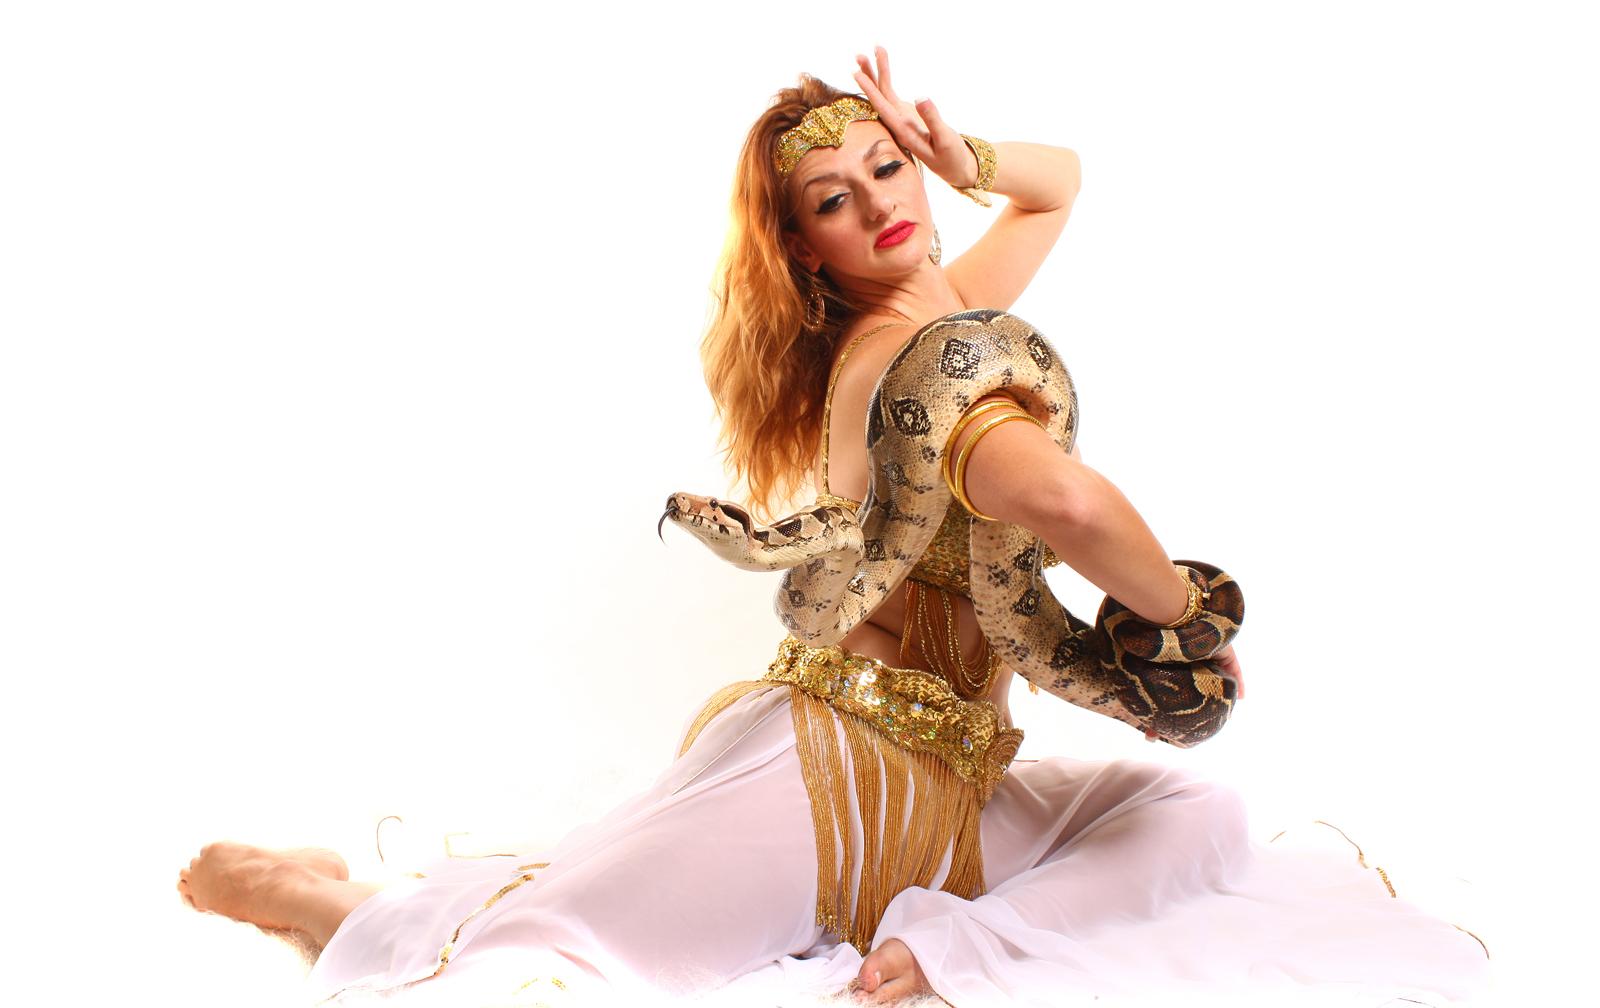 garas-b-toppro-gallery-2012-13